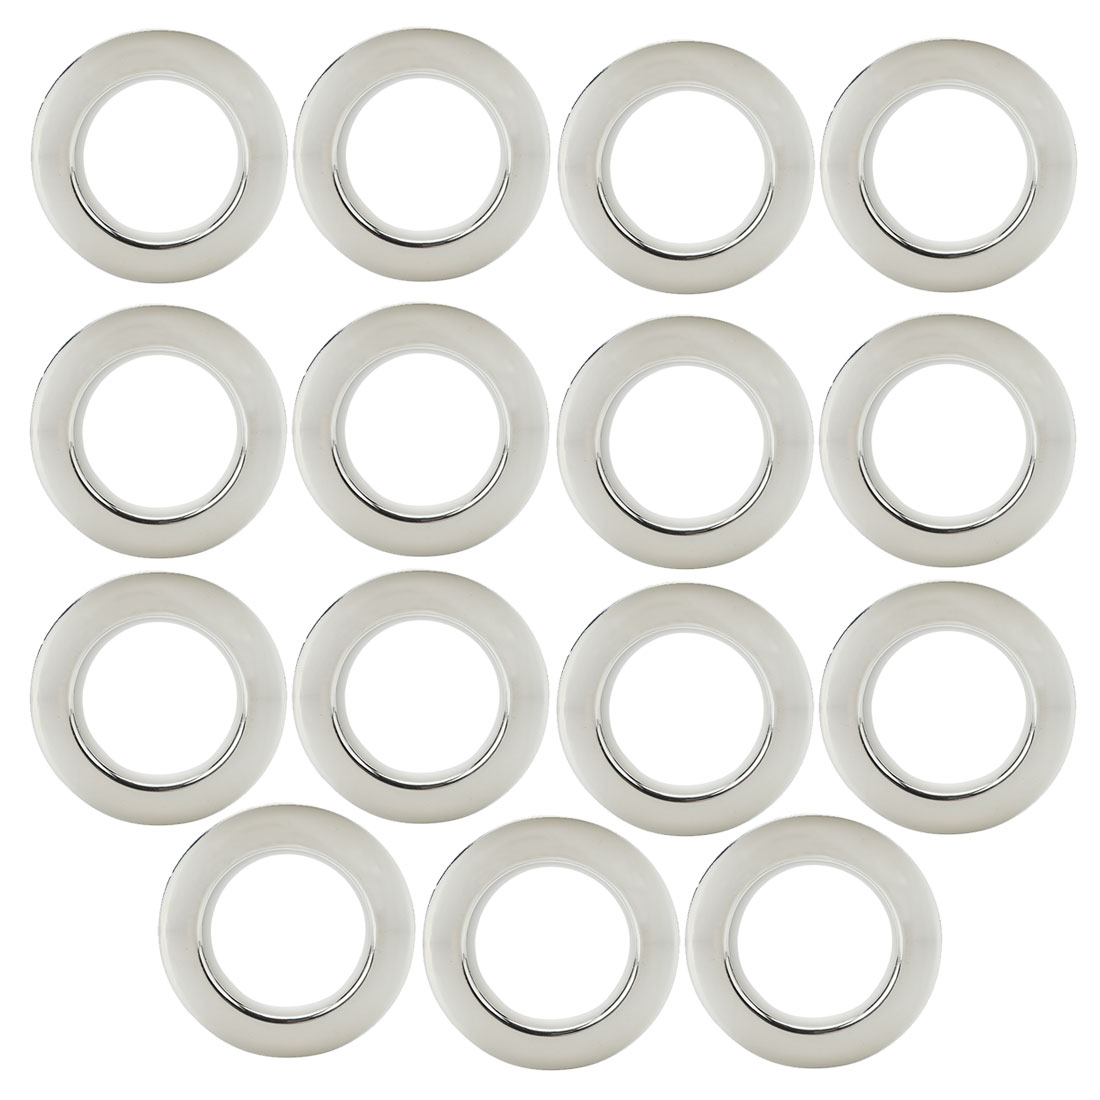 Bathroom Shower Plastic Curtain Ring Hook Sliding Hangers Silver Tone 15Pcs